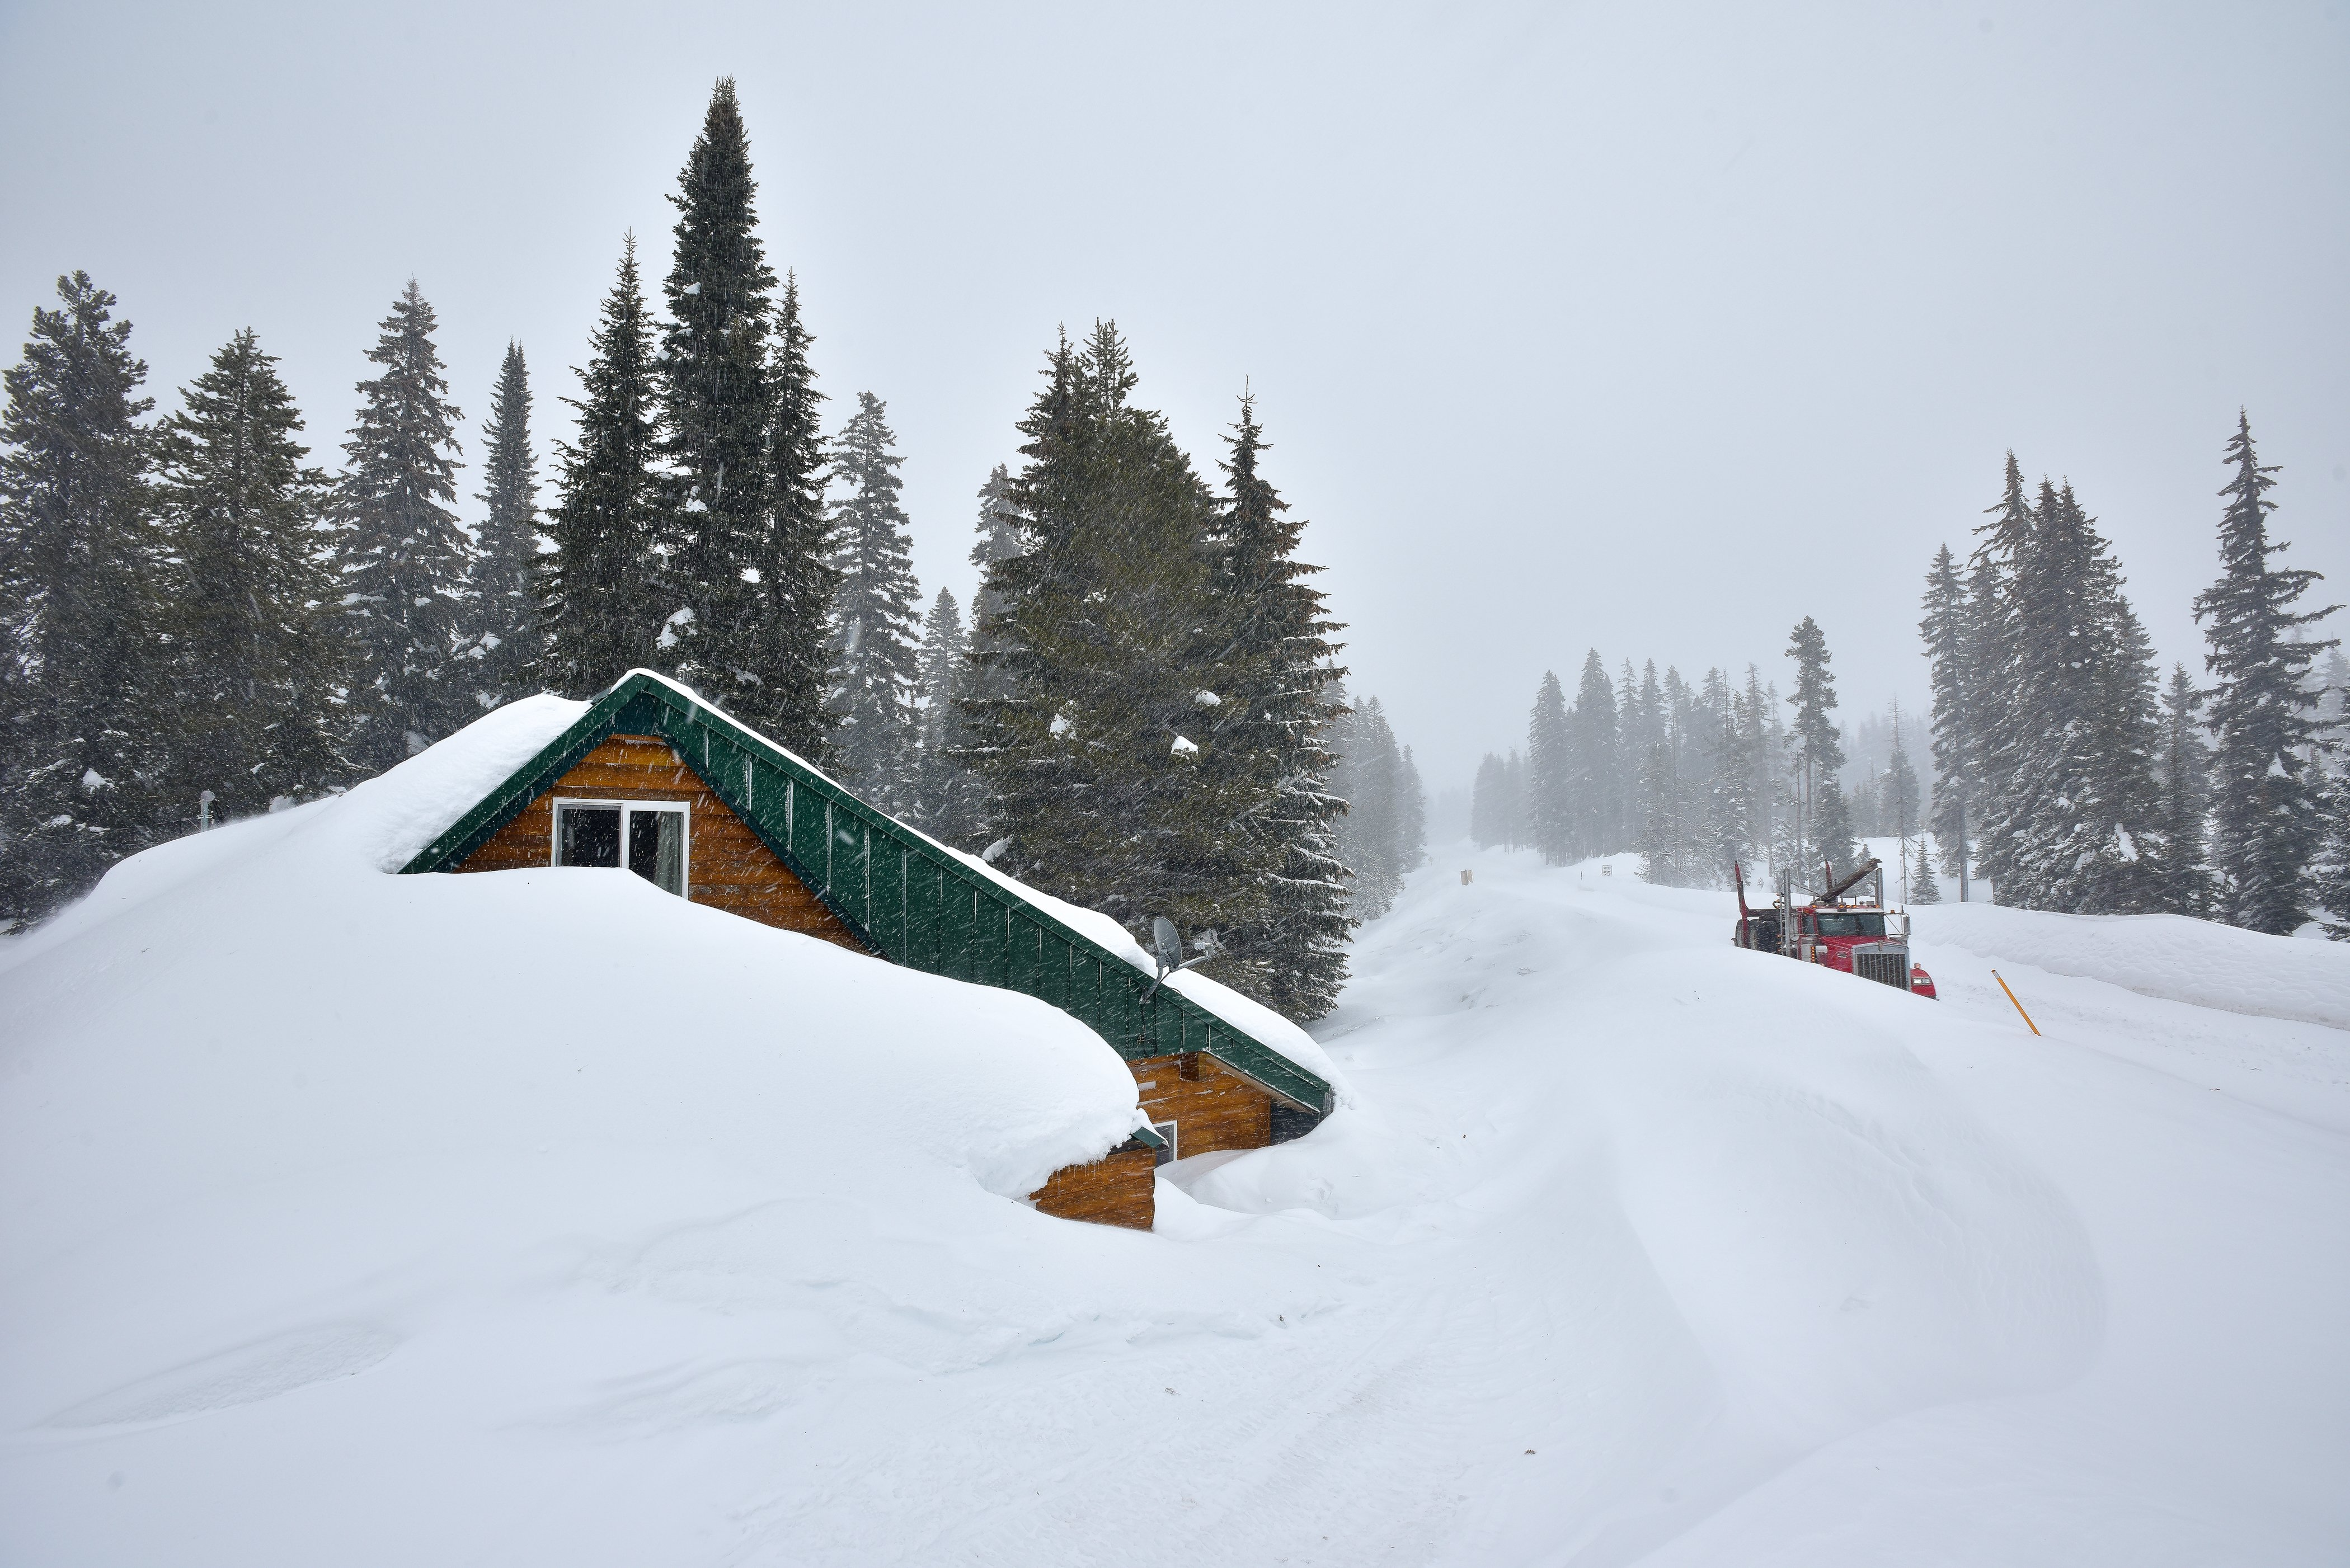 Slow Snow Melt Avoids Worst Case Scenarios Local News Eastoregonian Com